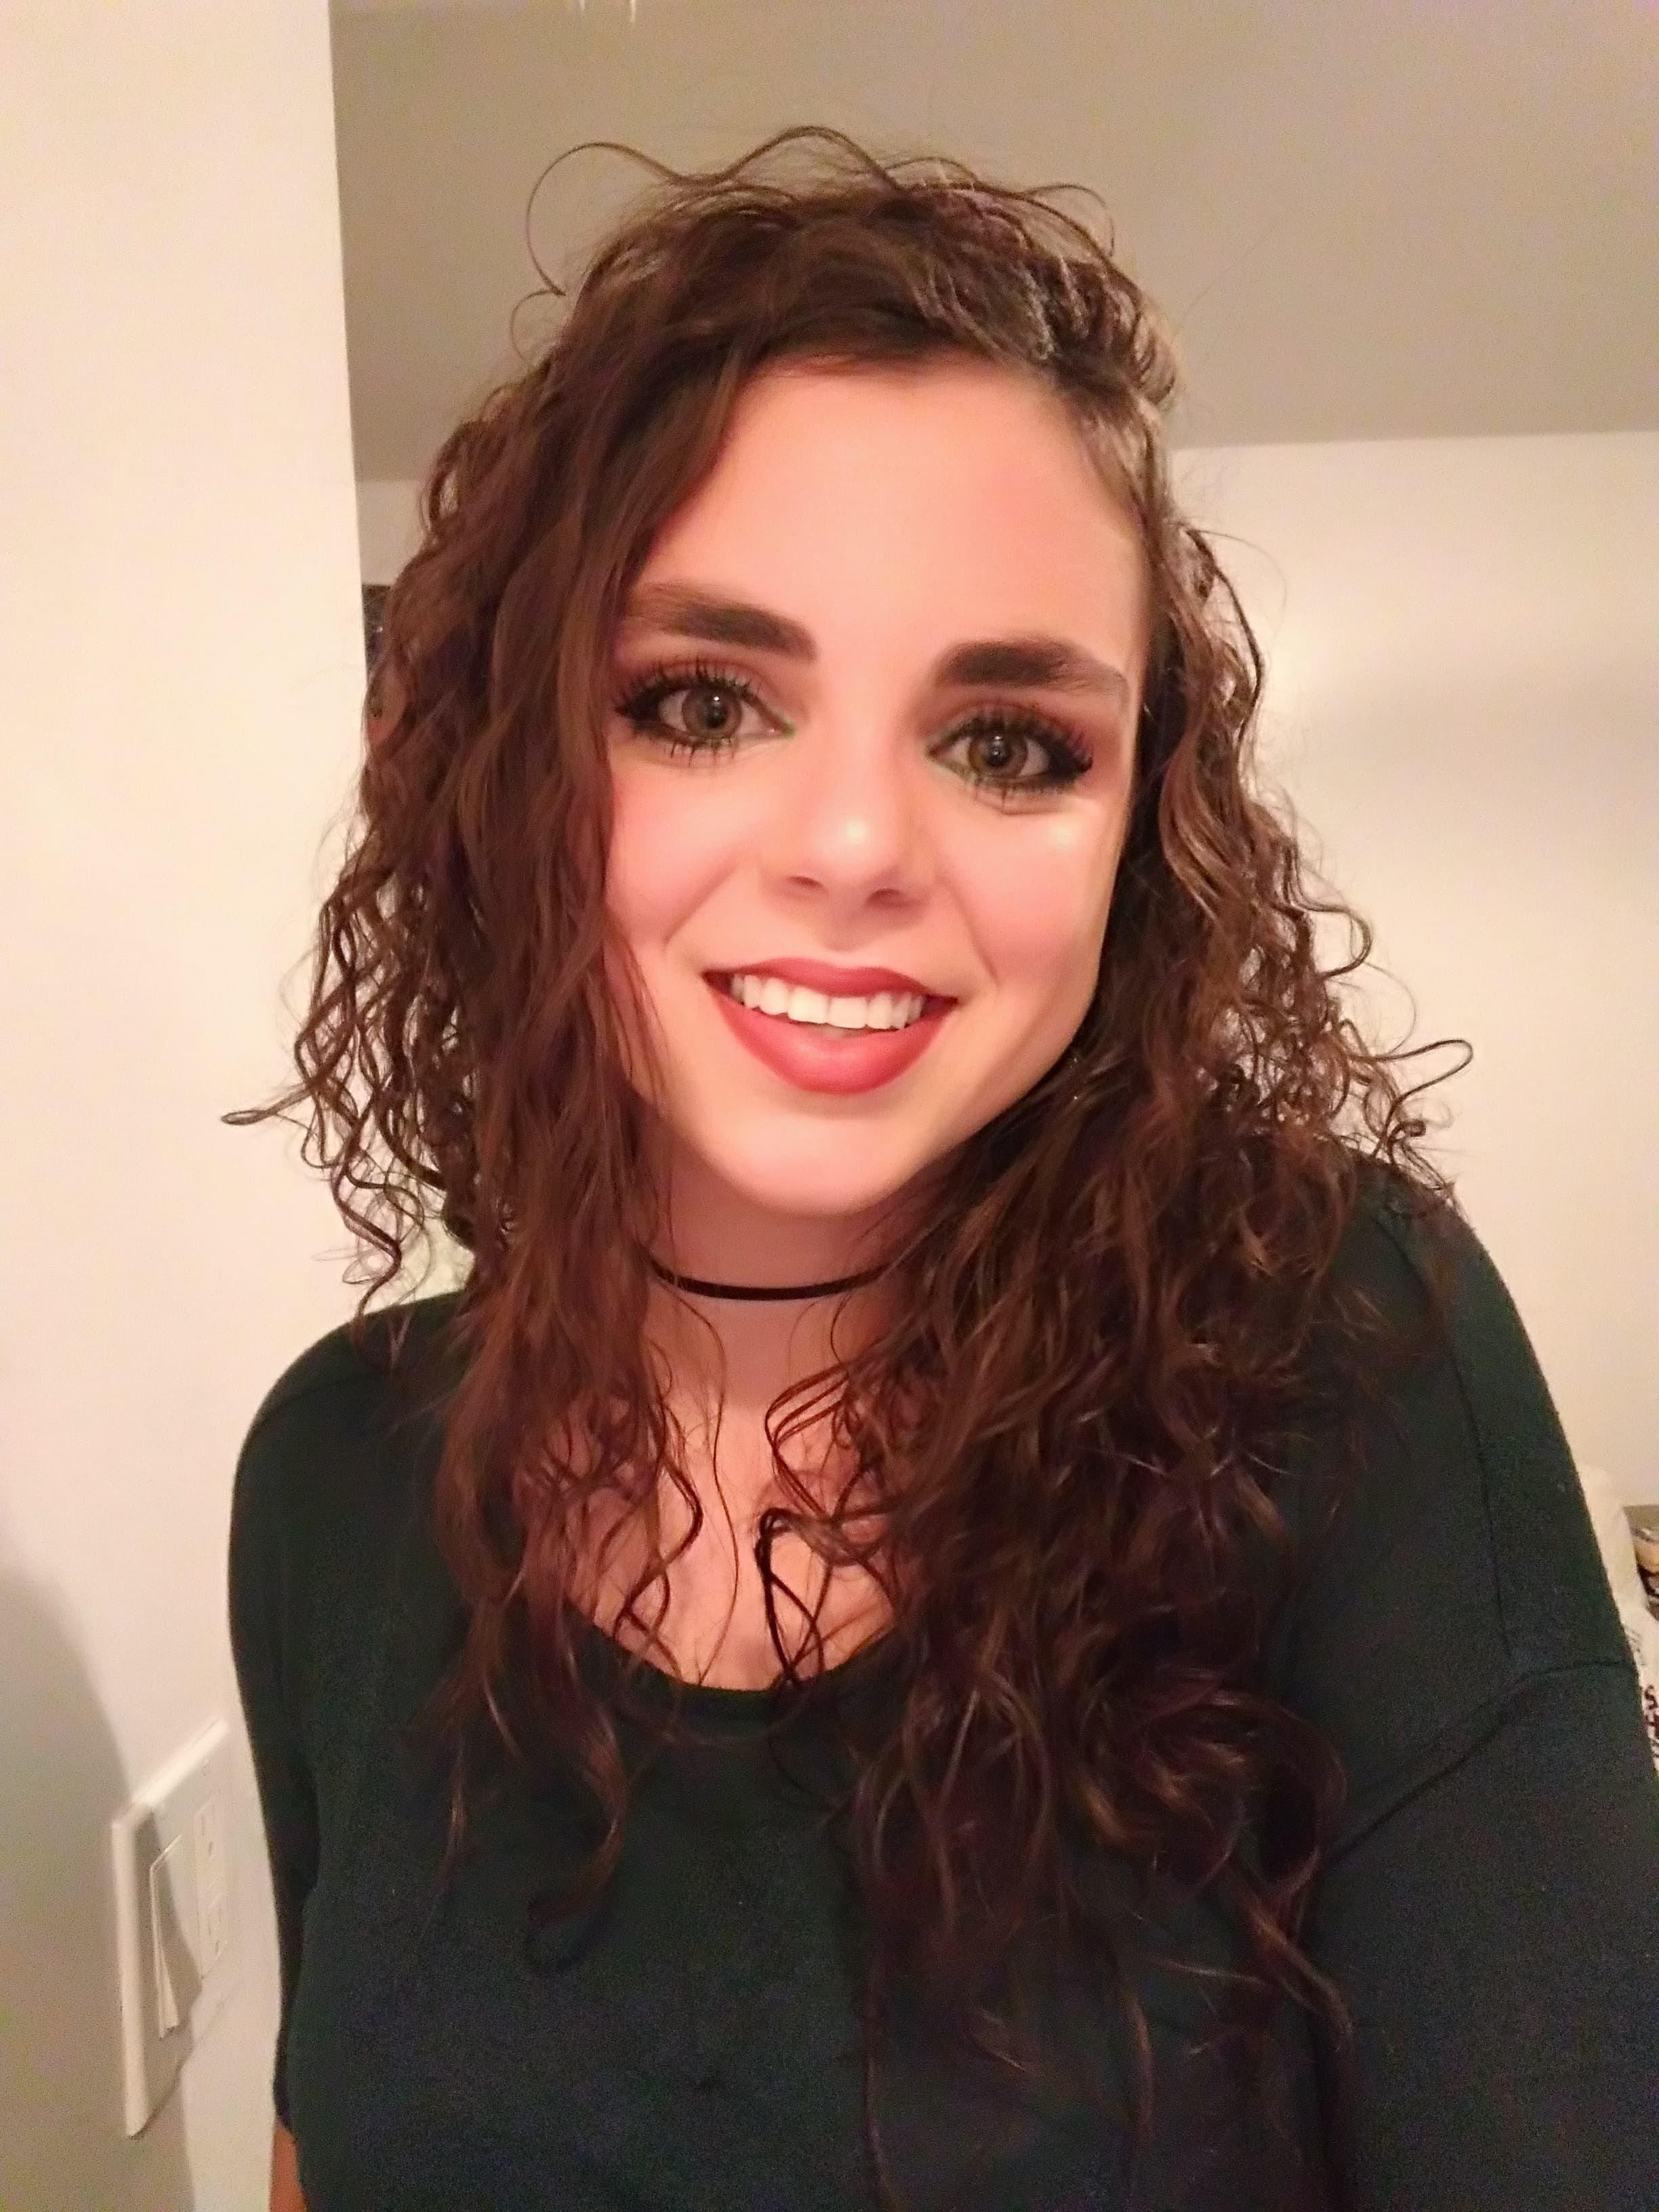 Go to Fernanda kovacs's profile